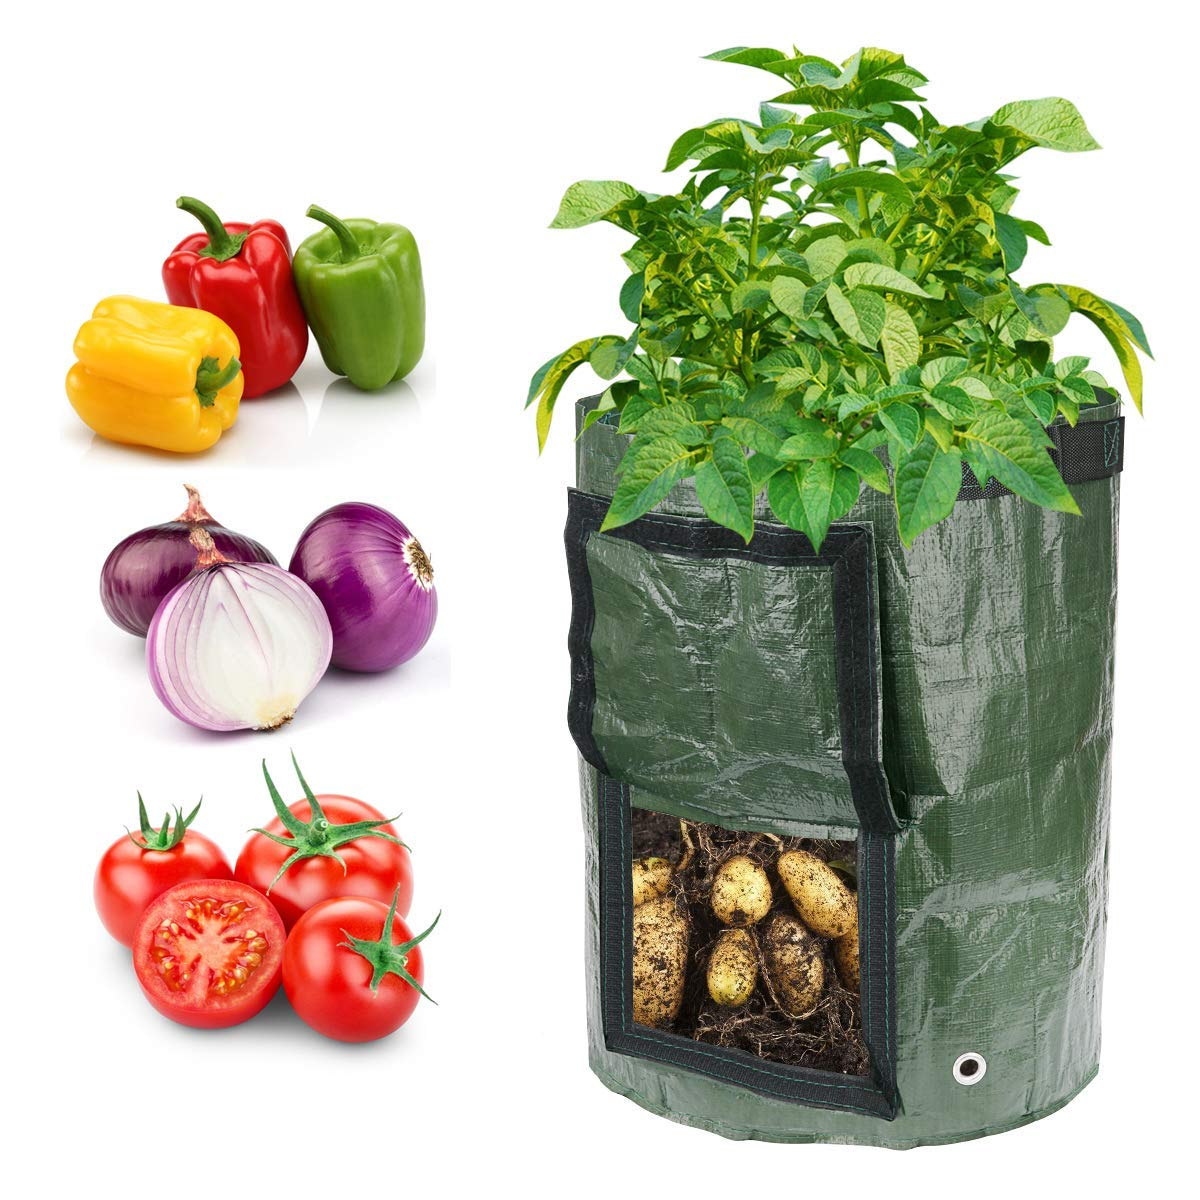 Potato Grow Bag 10 Gallon Fabric Plant Bags for Potato, Tomato, Onion, Carrot,Vegetable, Mushroom,Sweet Potato,Flowers Indoor Outdoor Pack-2